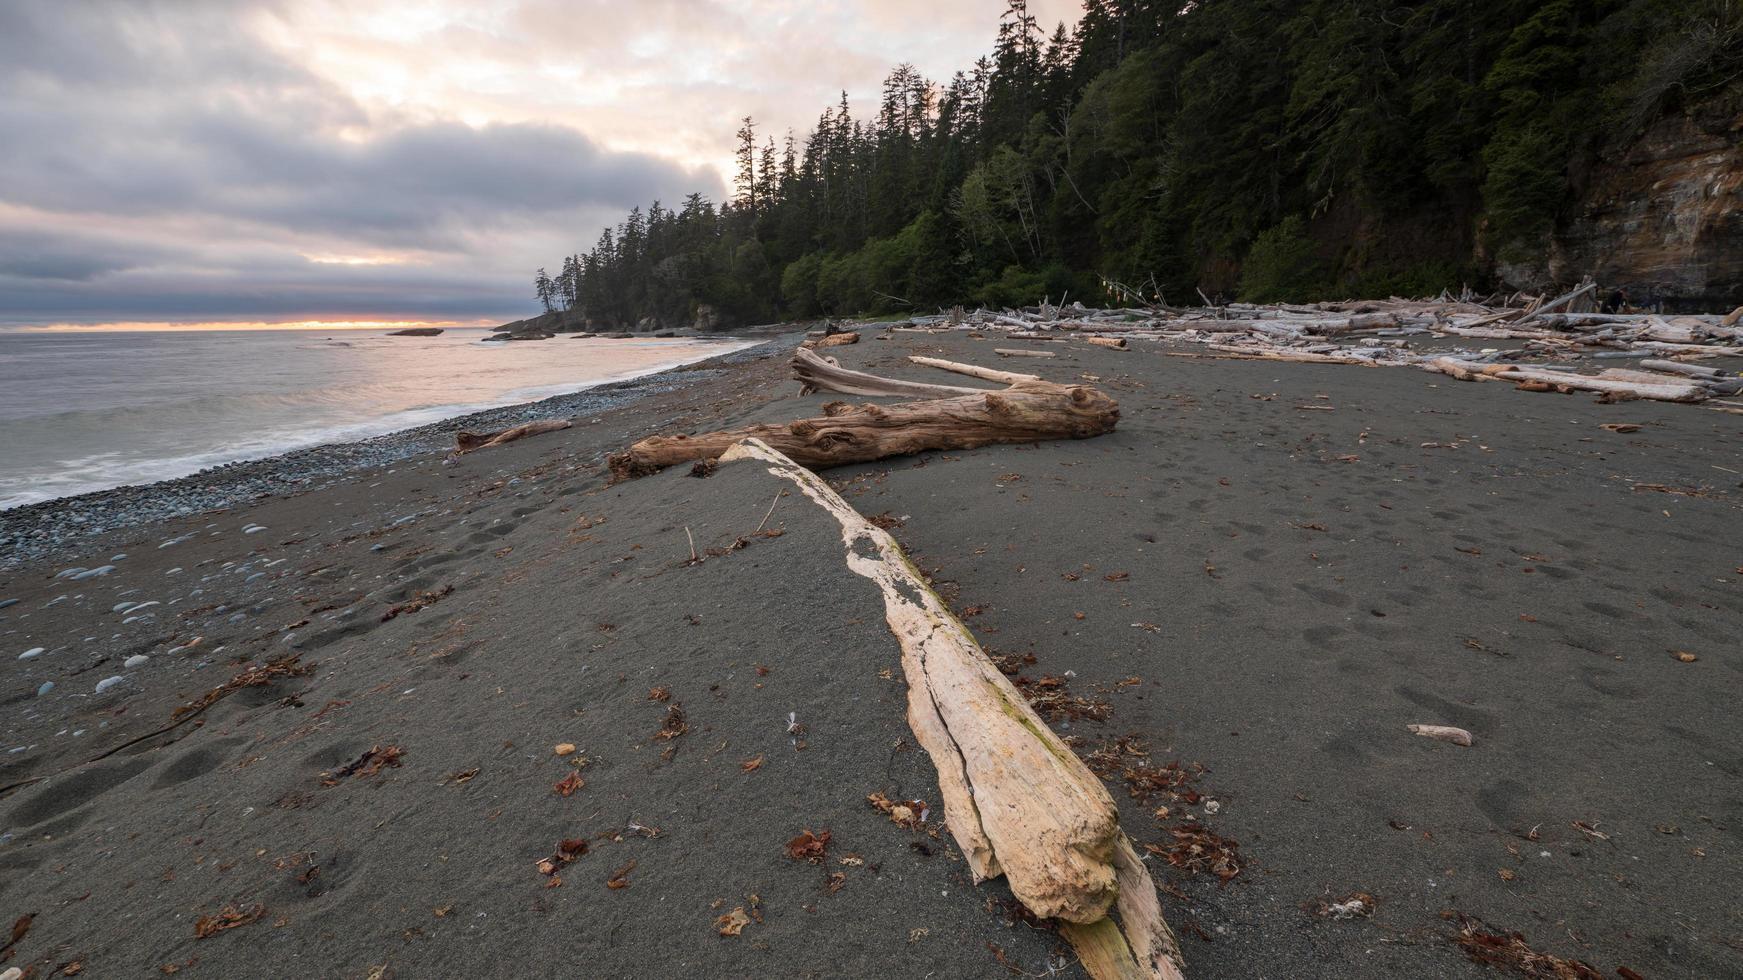 Brown wood log on beach photo